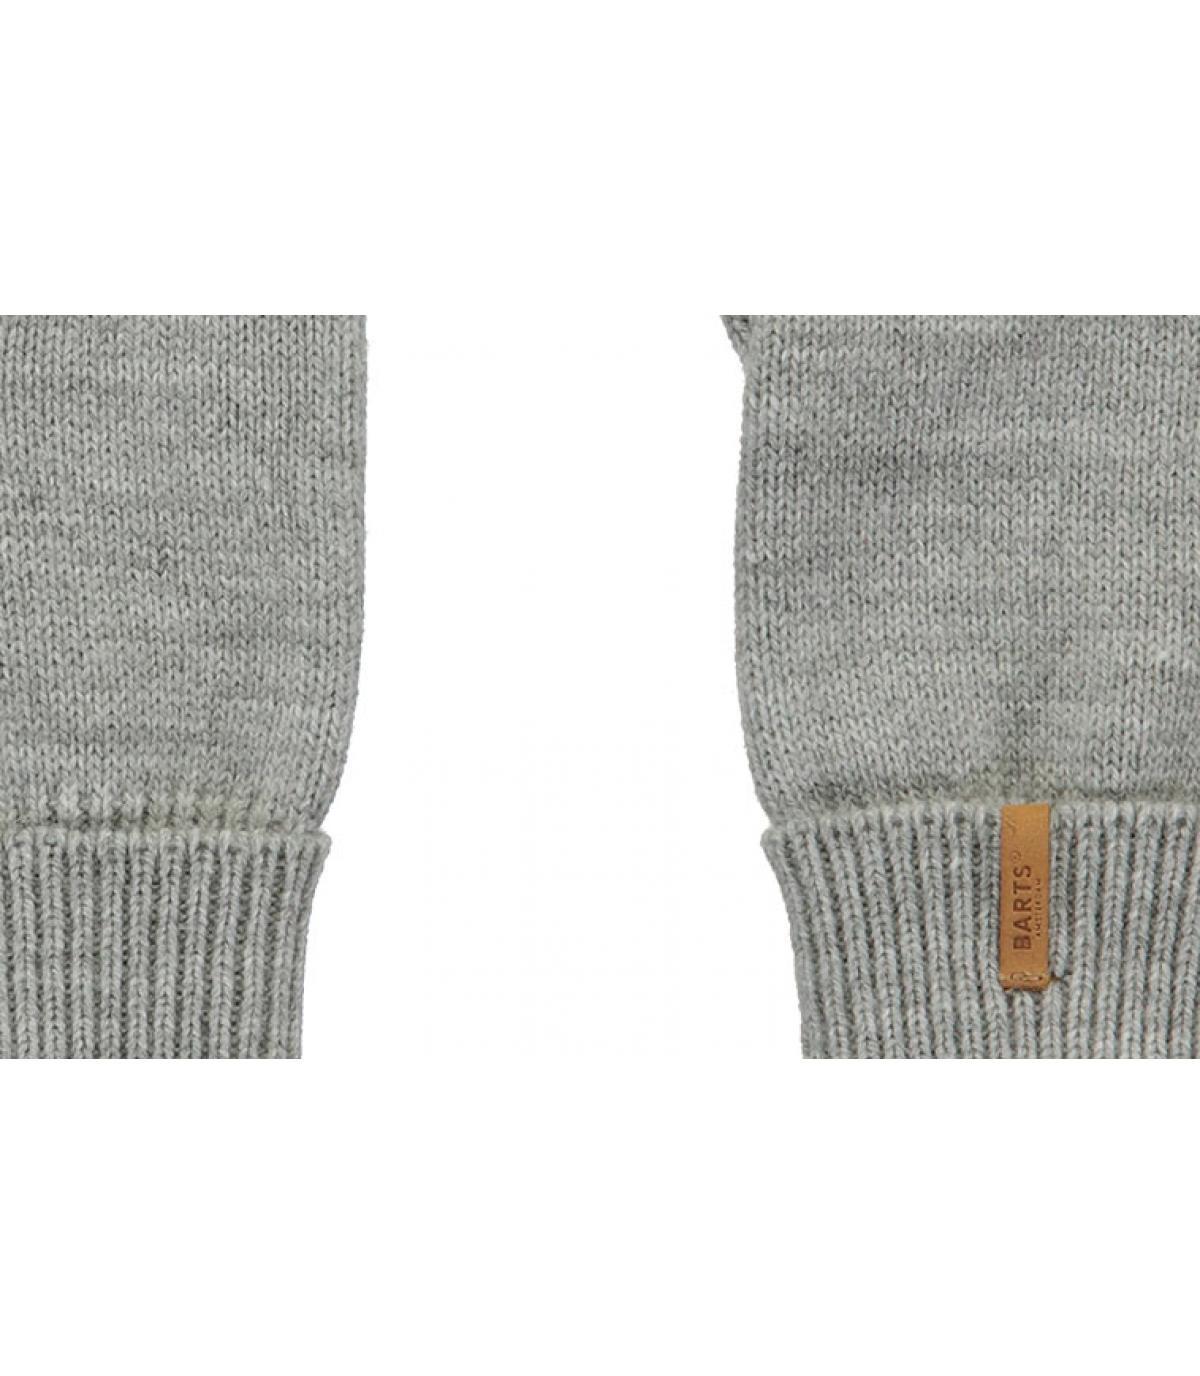 Details Fine Knitted Gloves heather grey - afbeeling 2